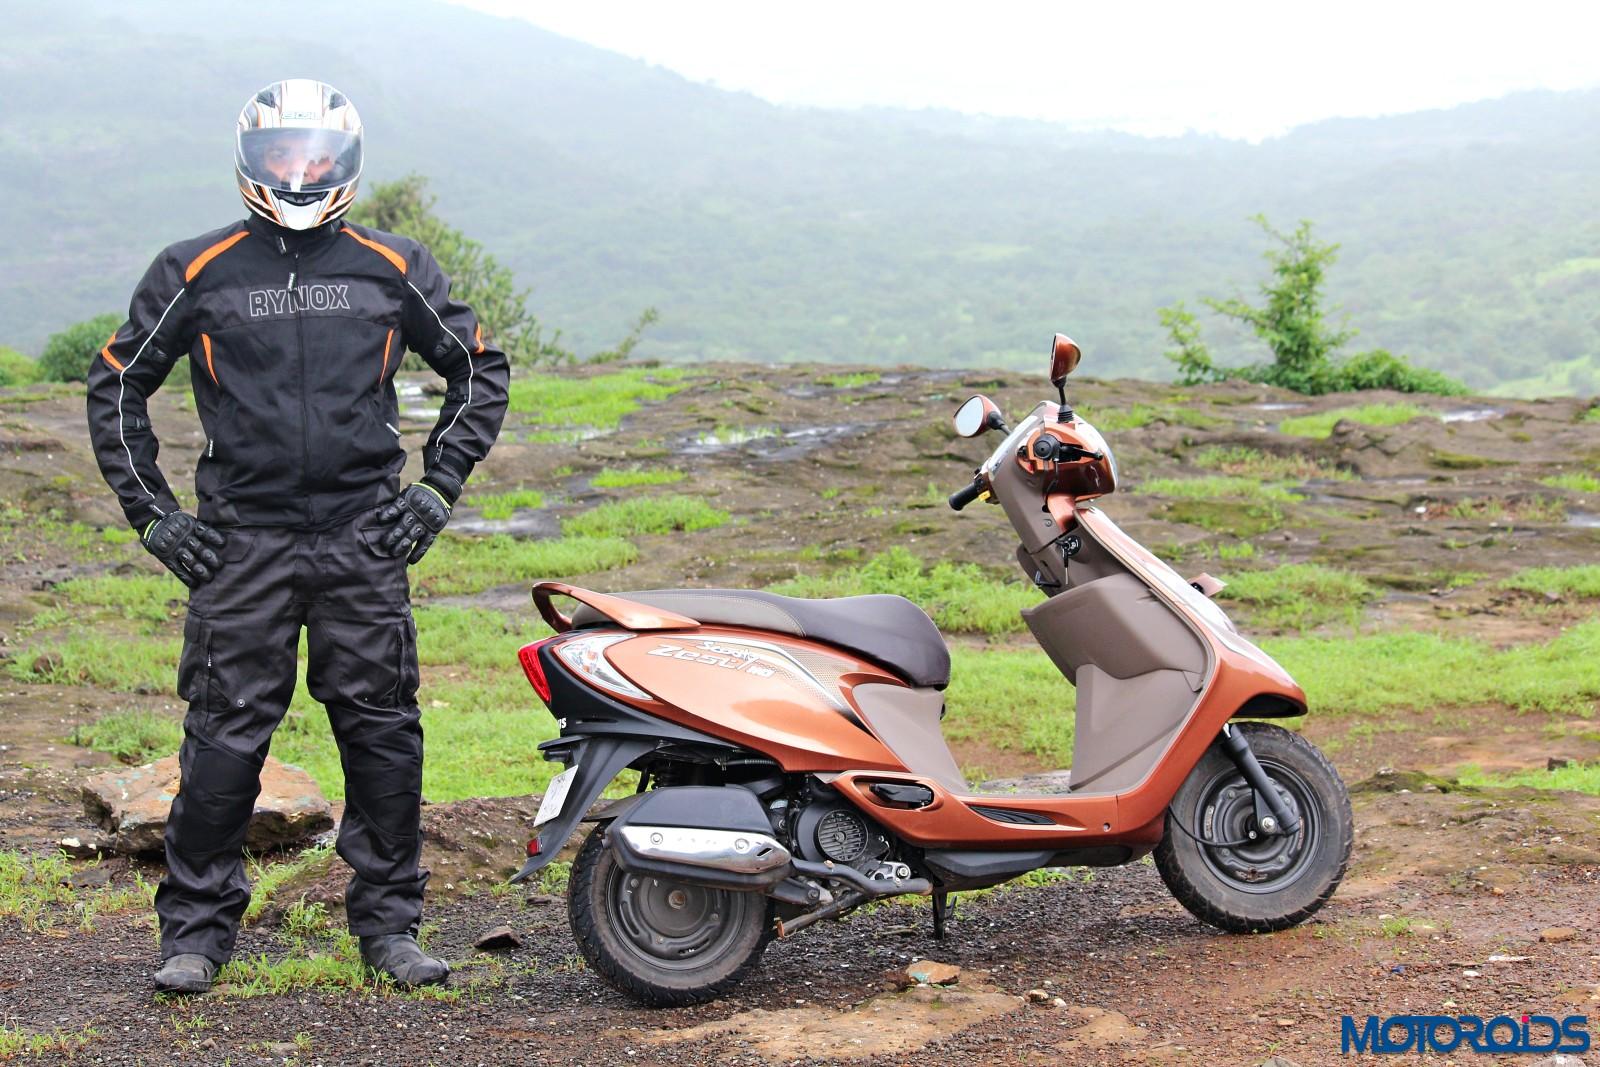 tvs-scooty-zest-how-to-buy-riding-gear-5